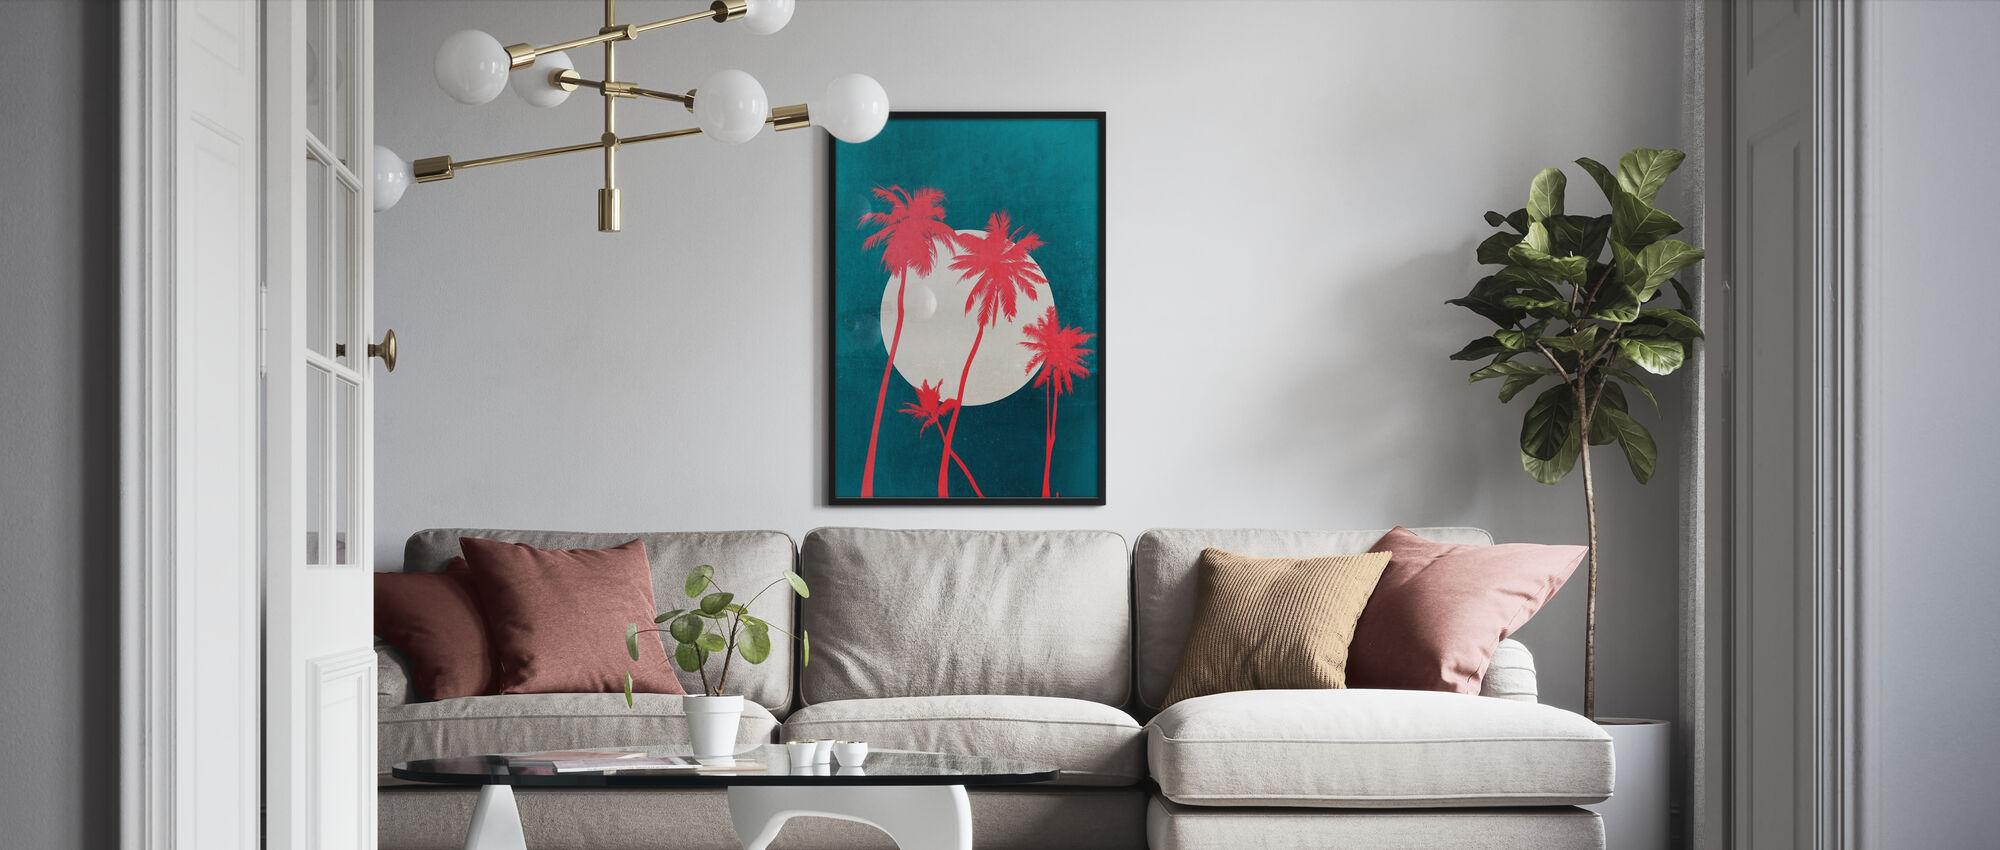 La Palma Moonshine - Poster - Living Room